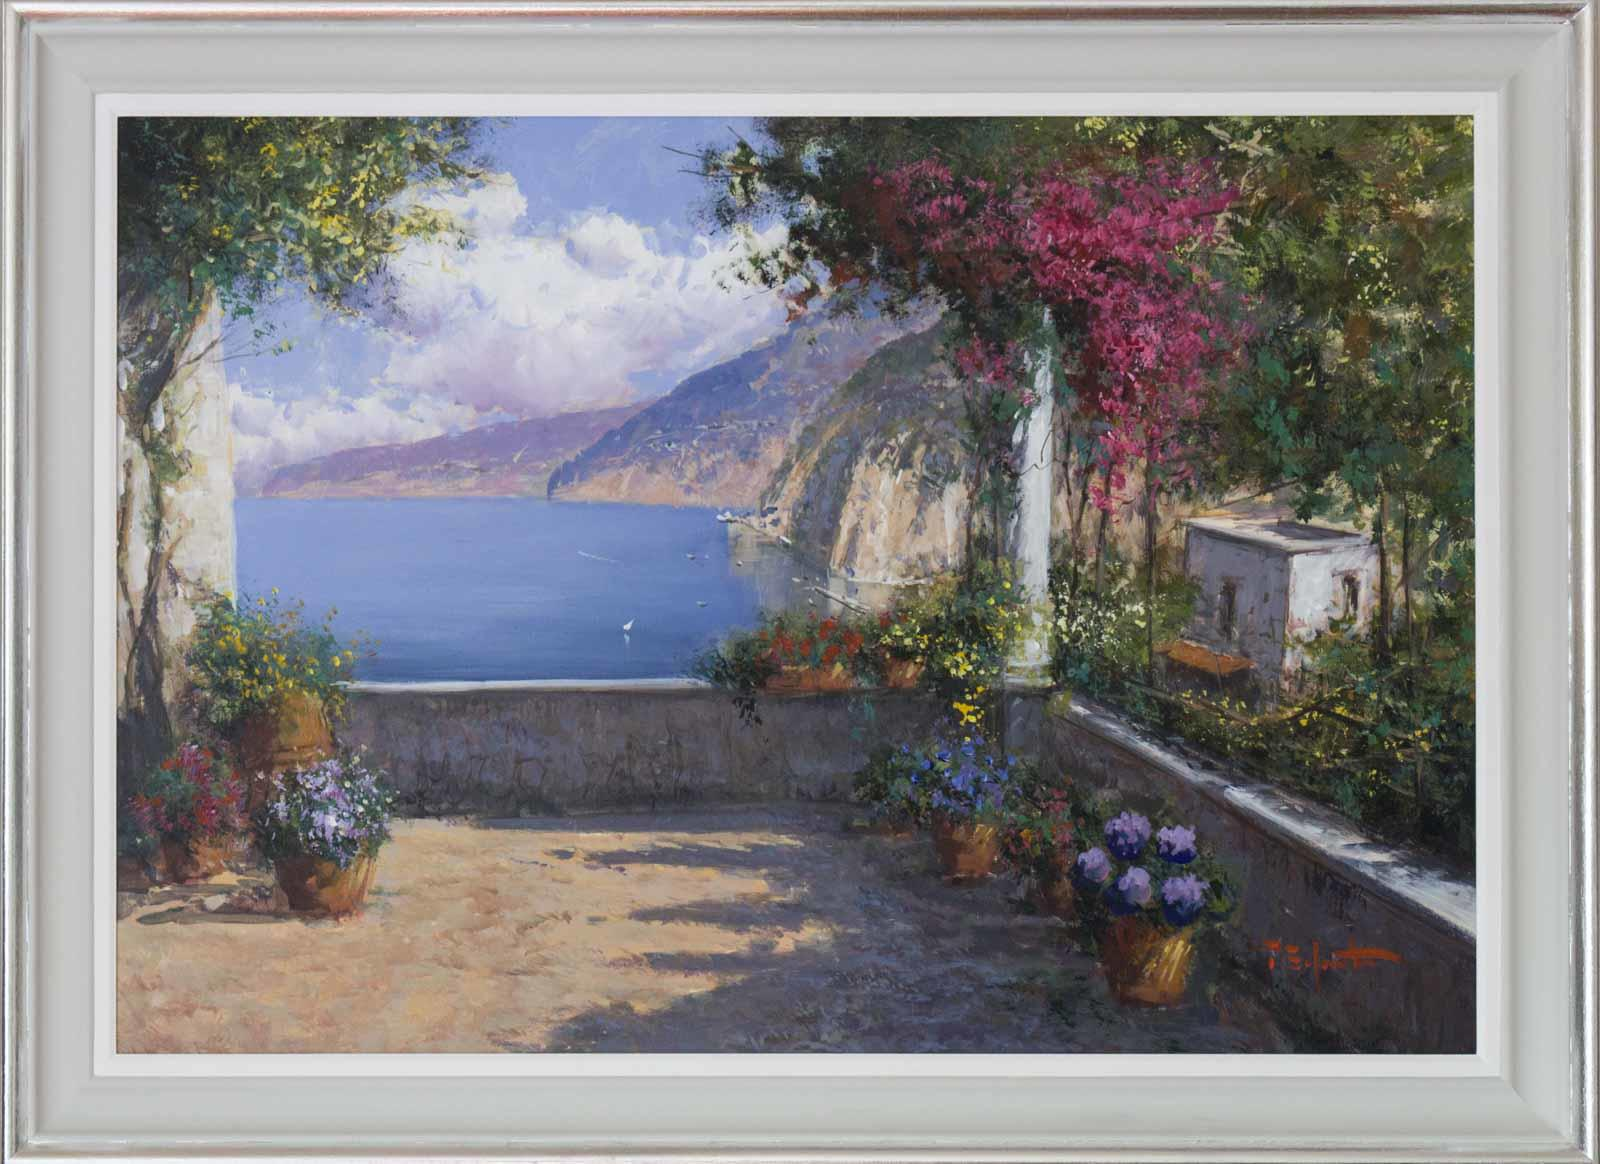 Coastal View, Pasquale Esposito